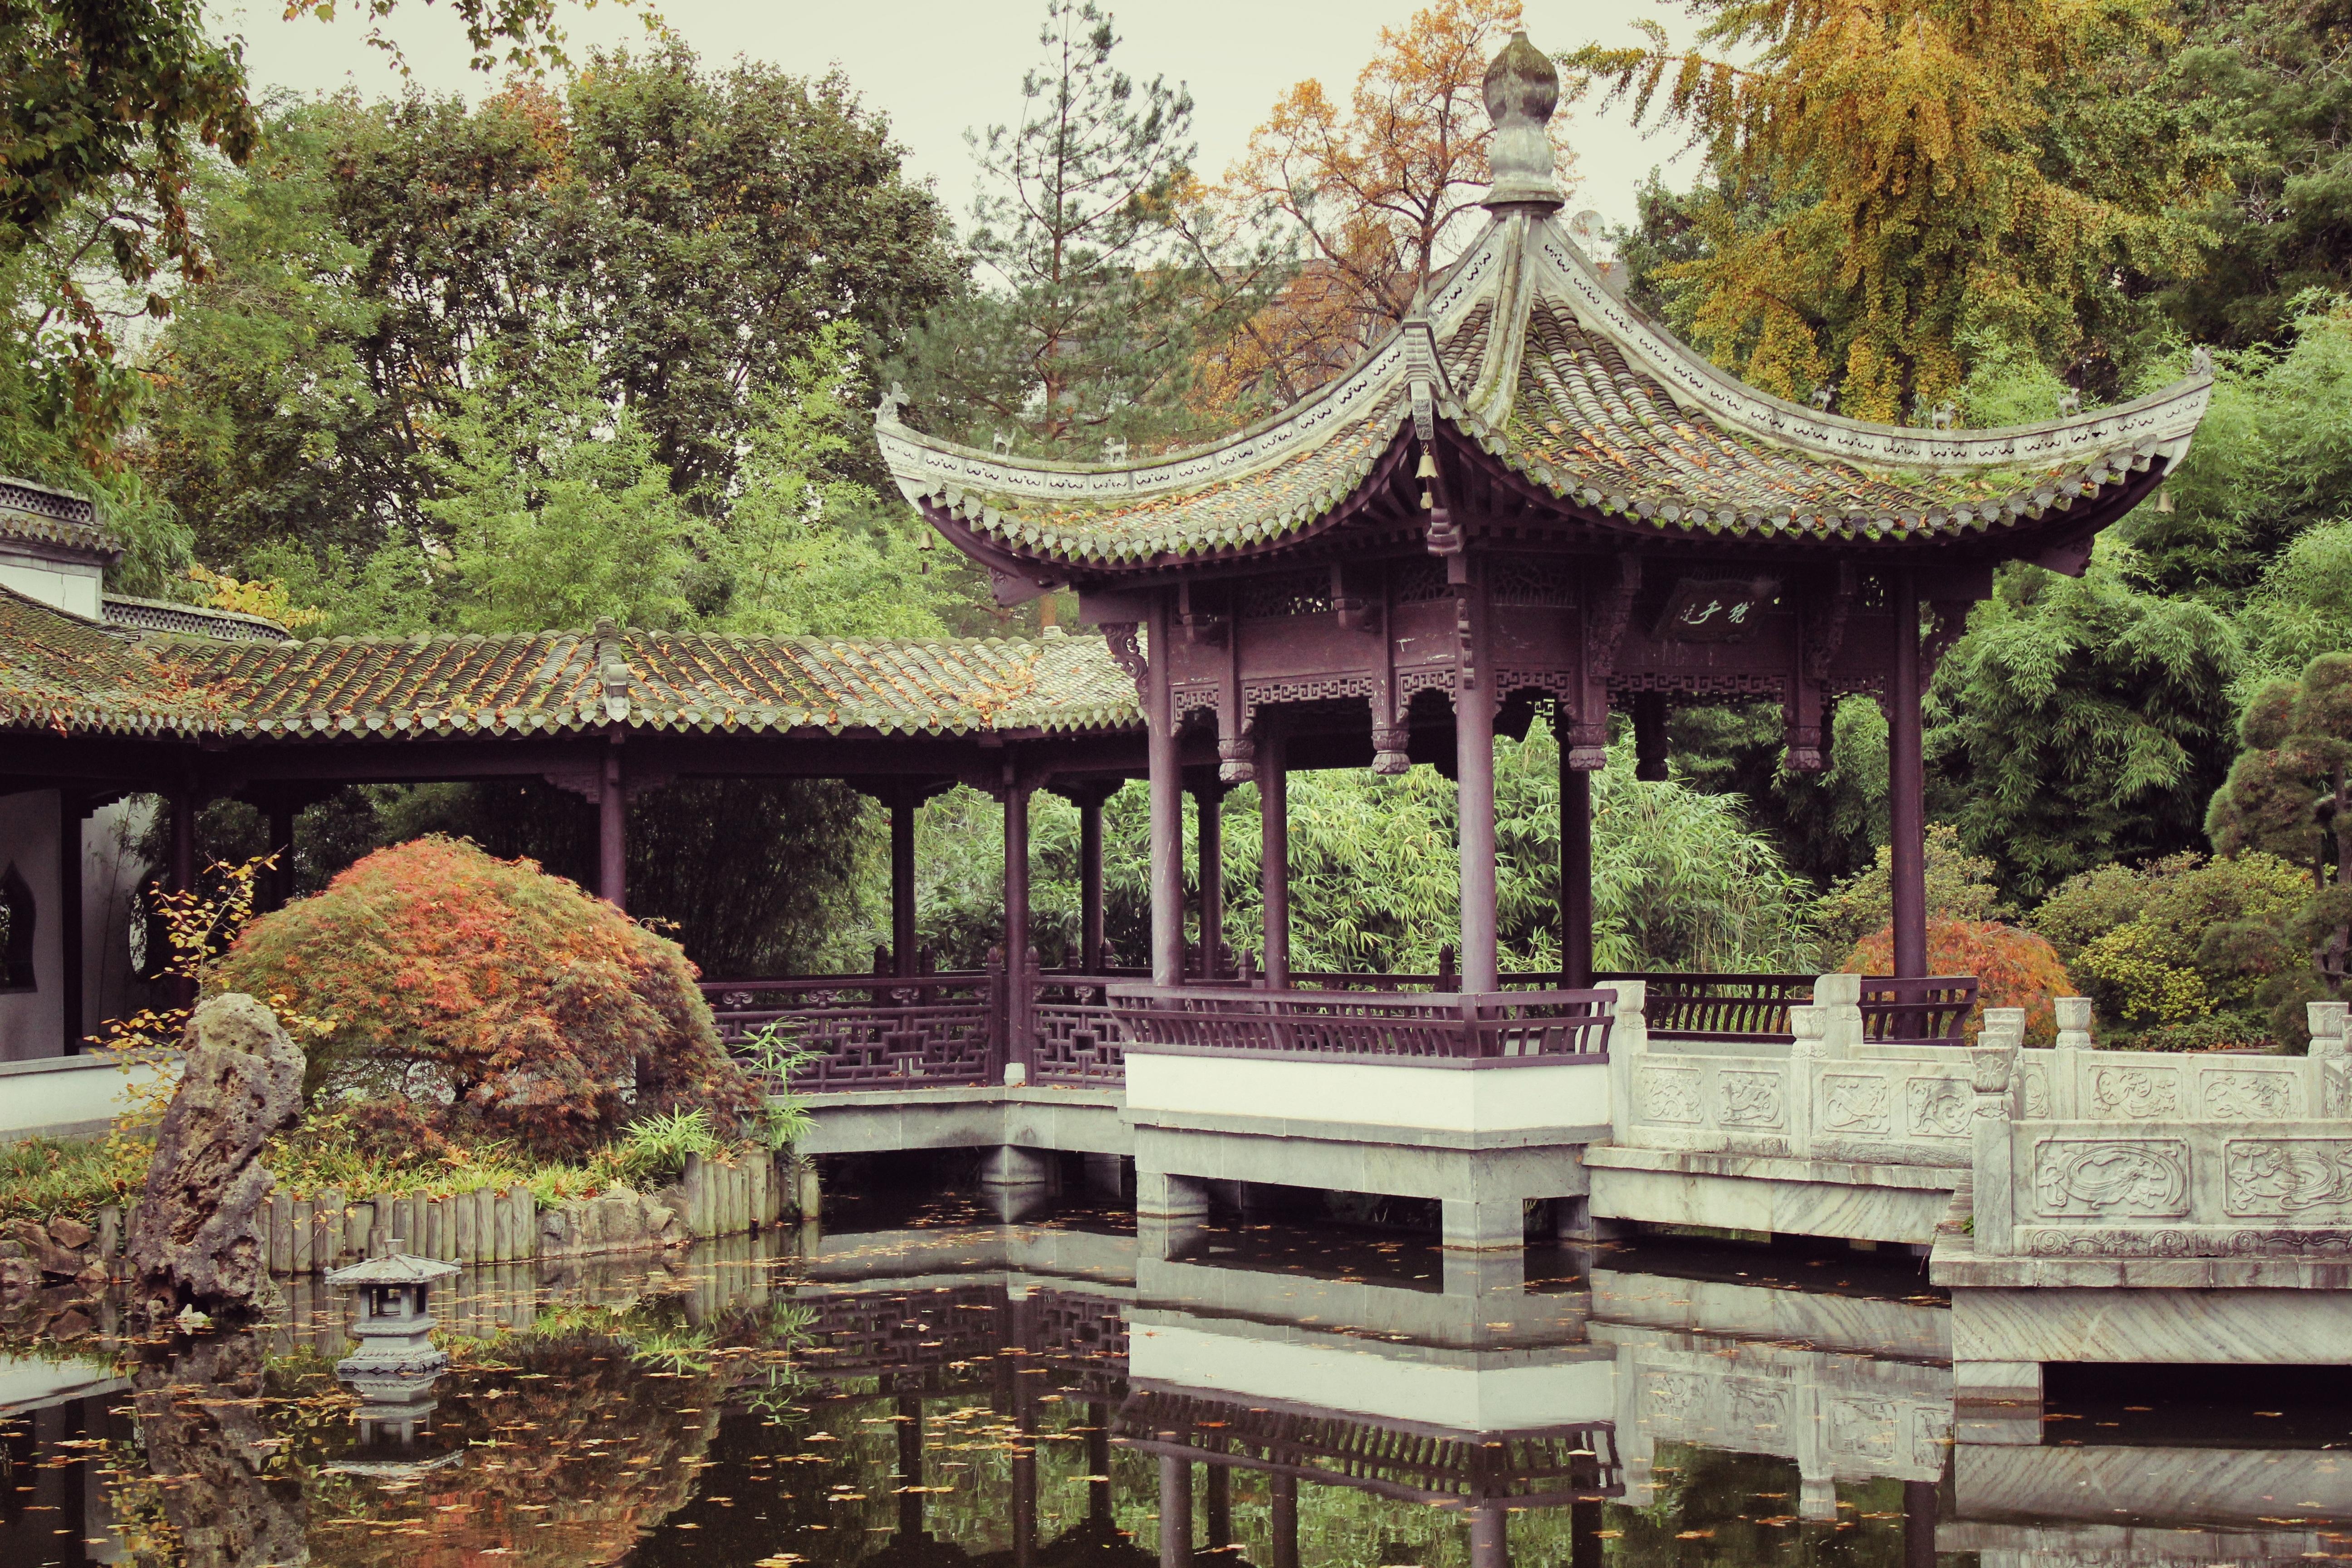 Palace Pond Asian Environment Chinese Peaceful Park Calm Garden Place Of Worship Temple Pavilion Shrine Botanical